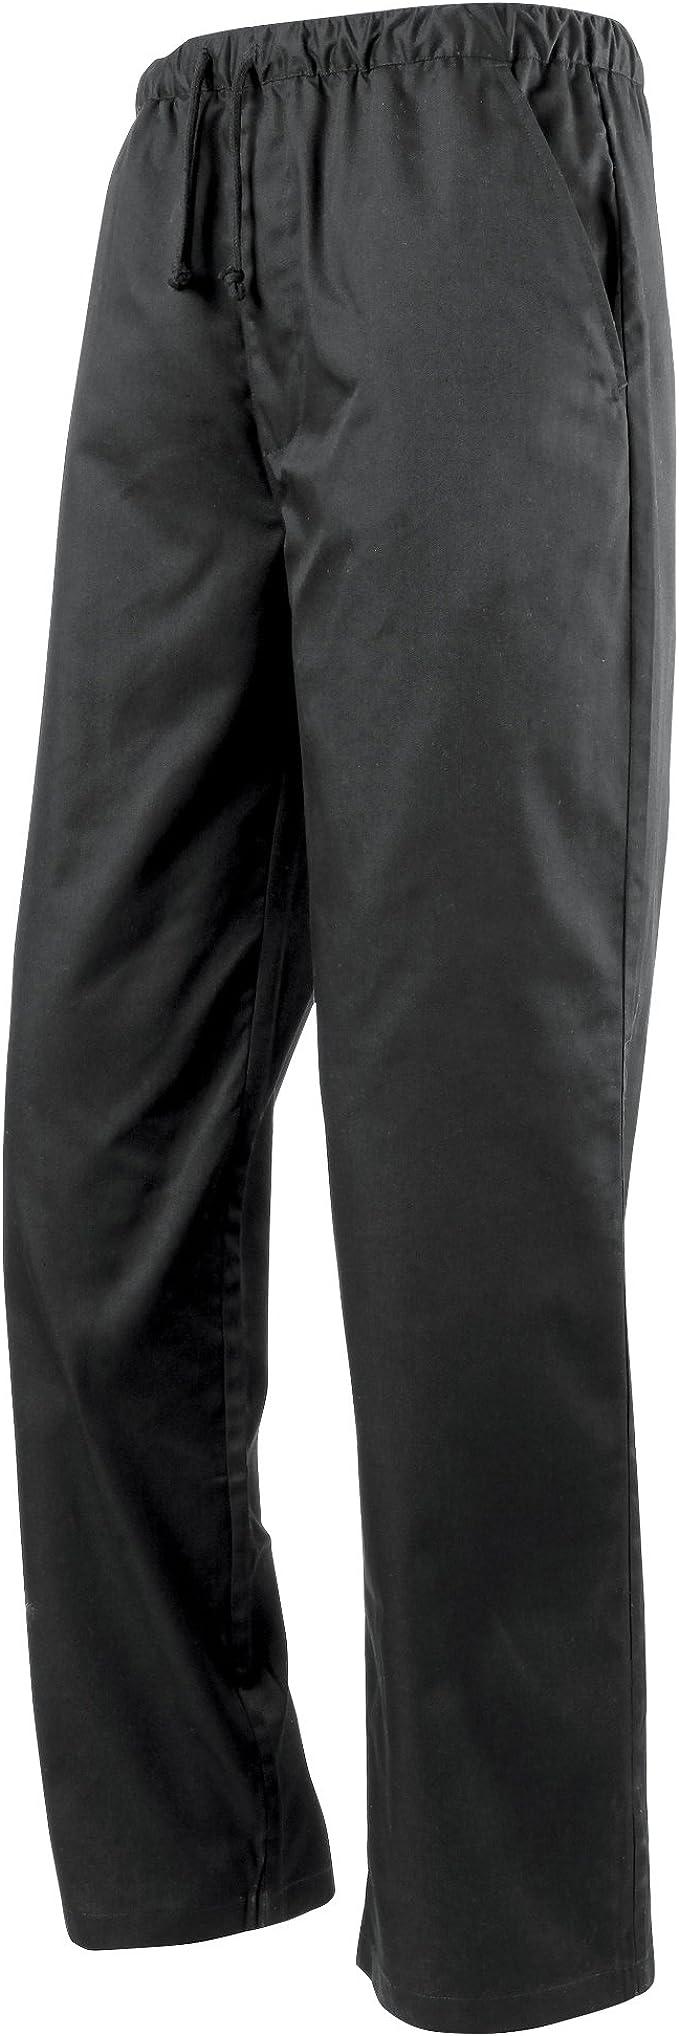 Premier Pantaloni da Chef Girovita Elasticizzato Unisex